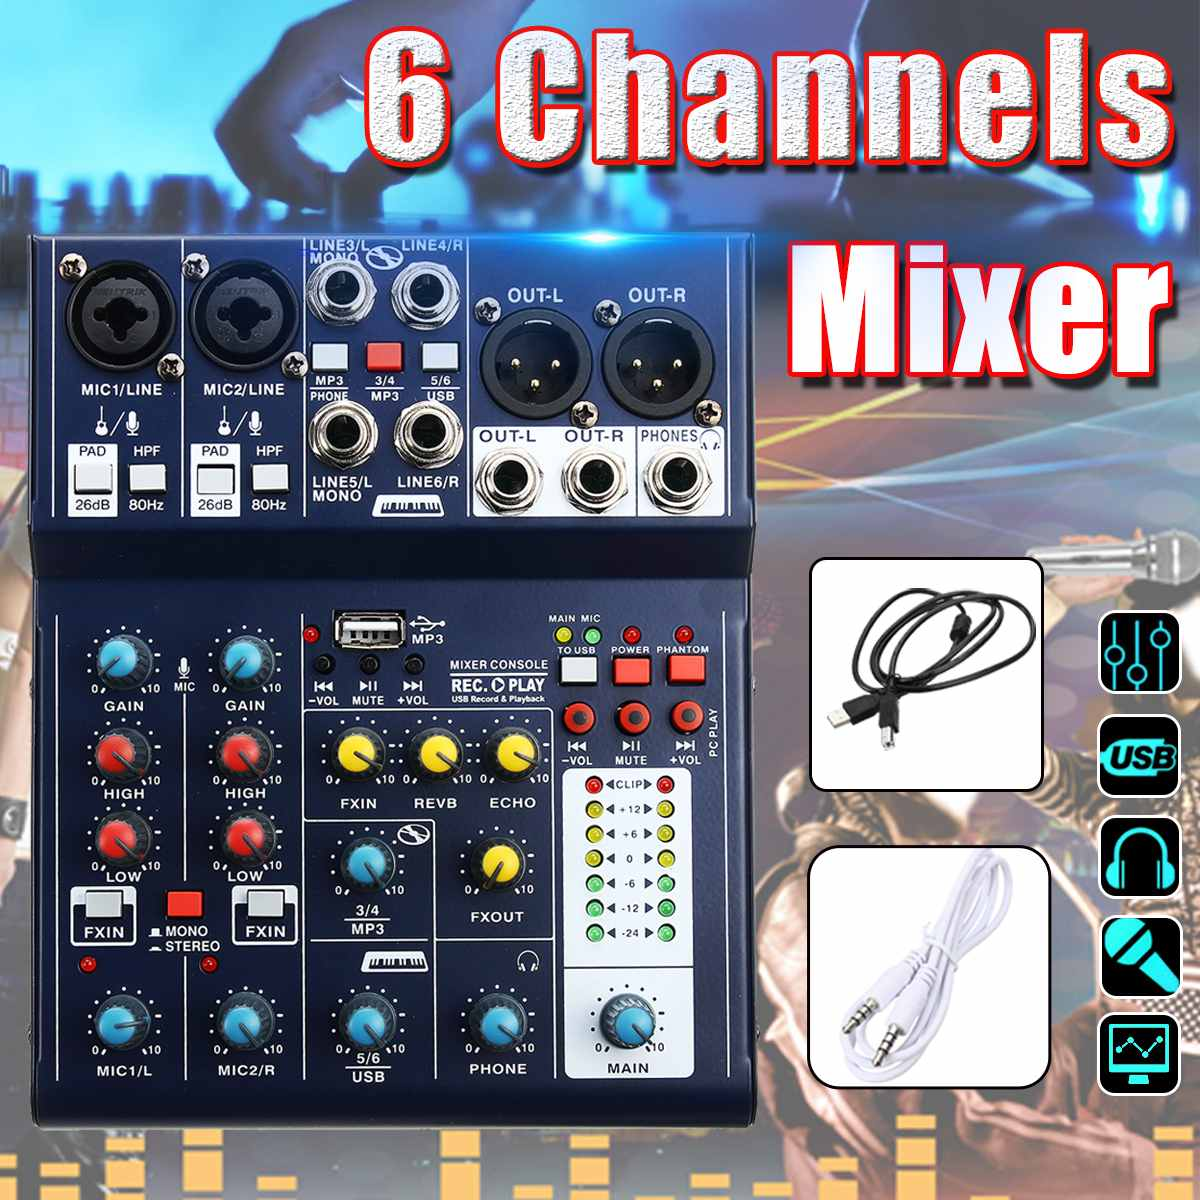 Consola de sonido de Karaoke de 6 canales mezcladora de discos USB 48V Phantom DSP mezclador de Audio USB efecto U disco MP3 para KTV en vivo